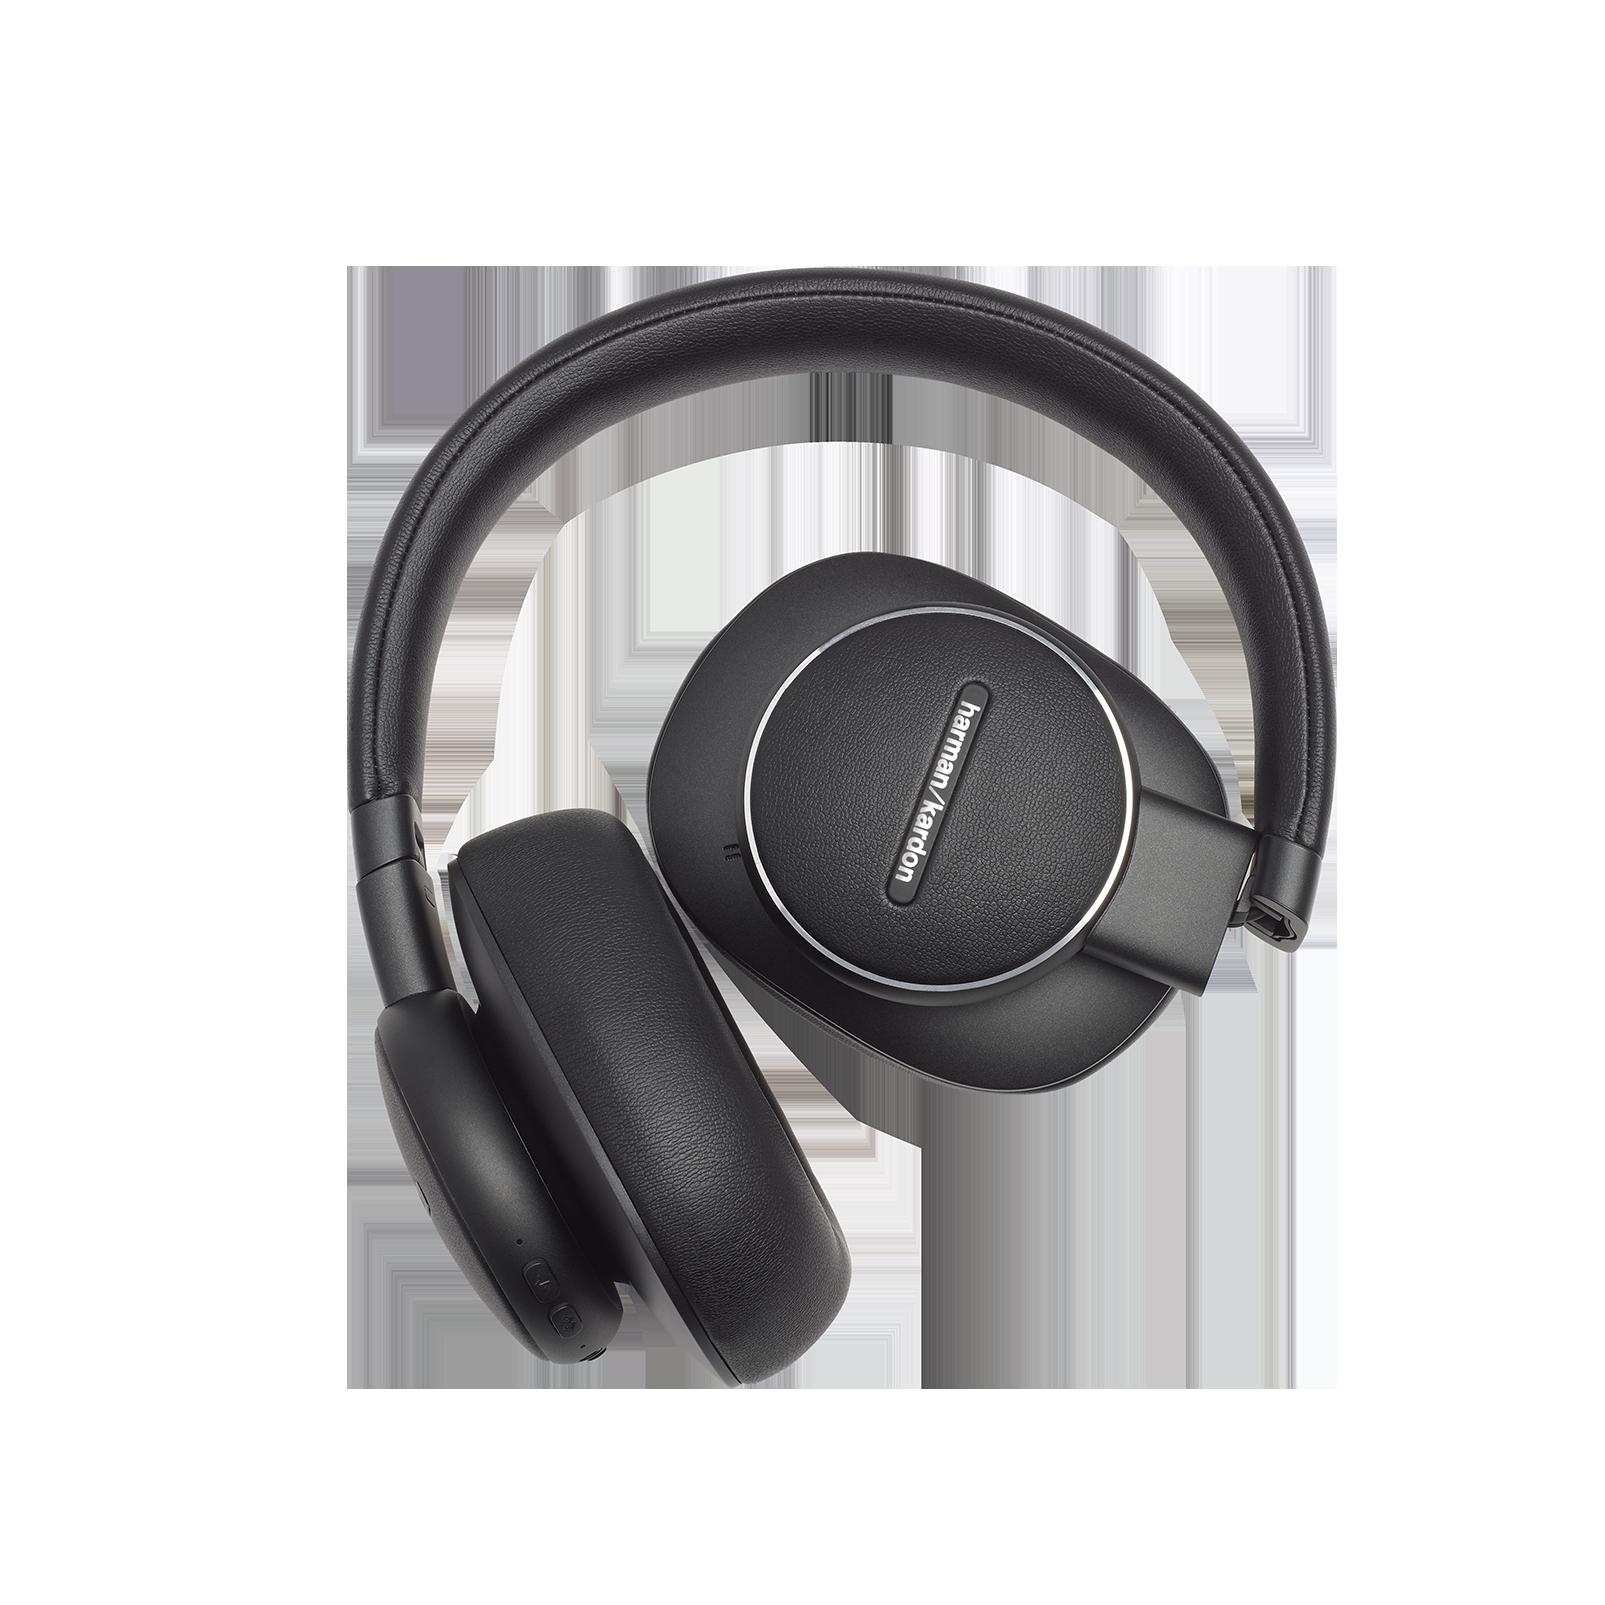 Harman Kardon FLY ANC - Black - Wireless Over-Ear NC Headphones - Detailshot 4